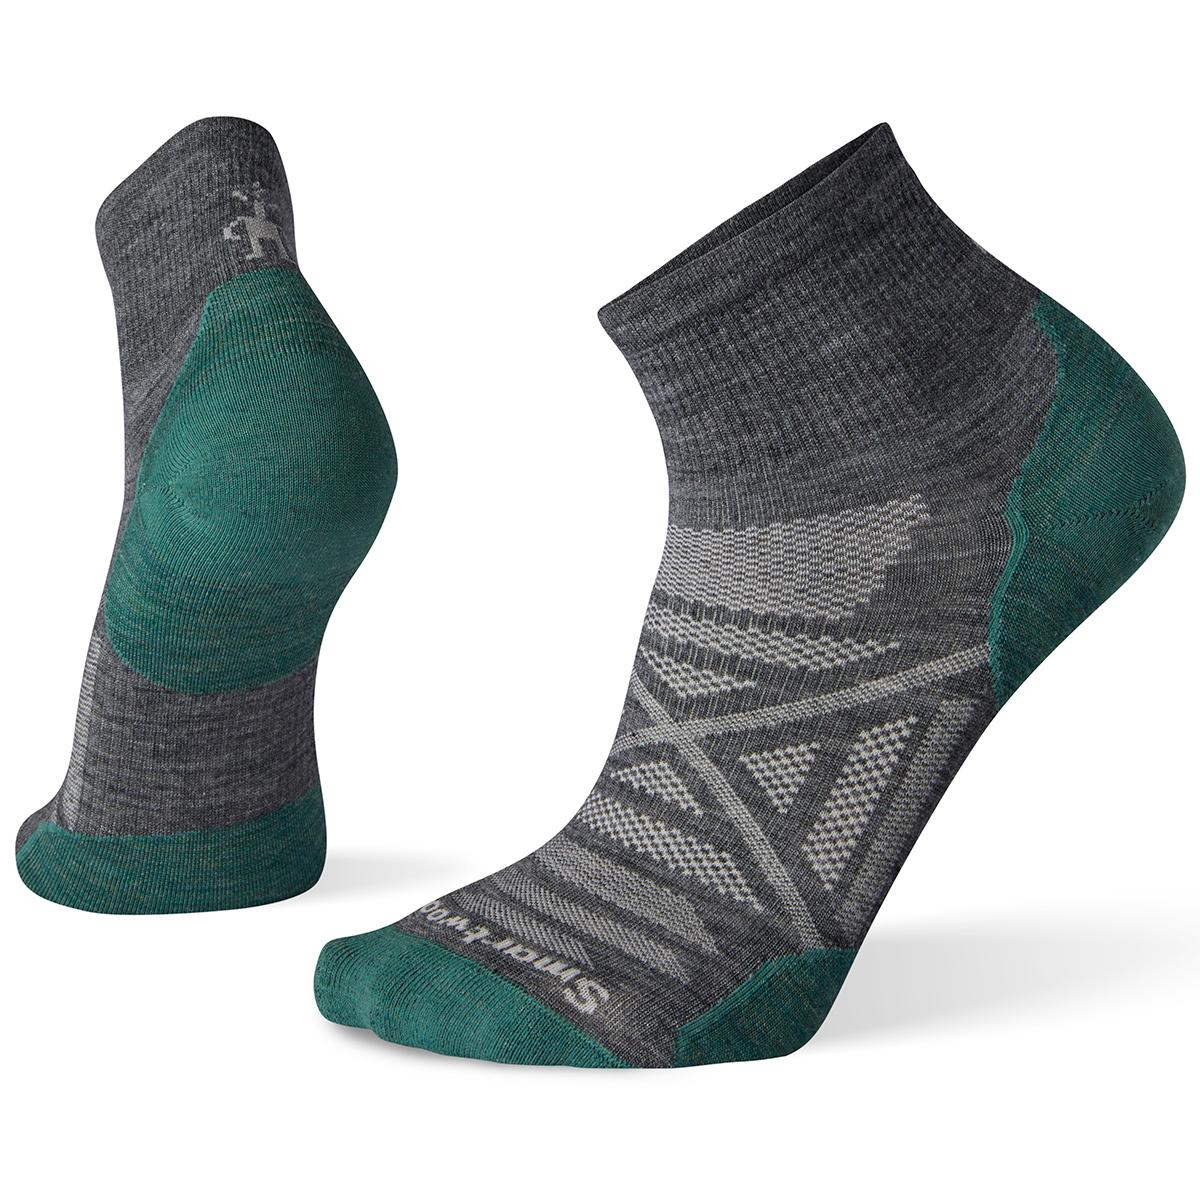 Smartwool Men's Phd Outdoor Ultra Light Mini Hiking Socks - Black, XL